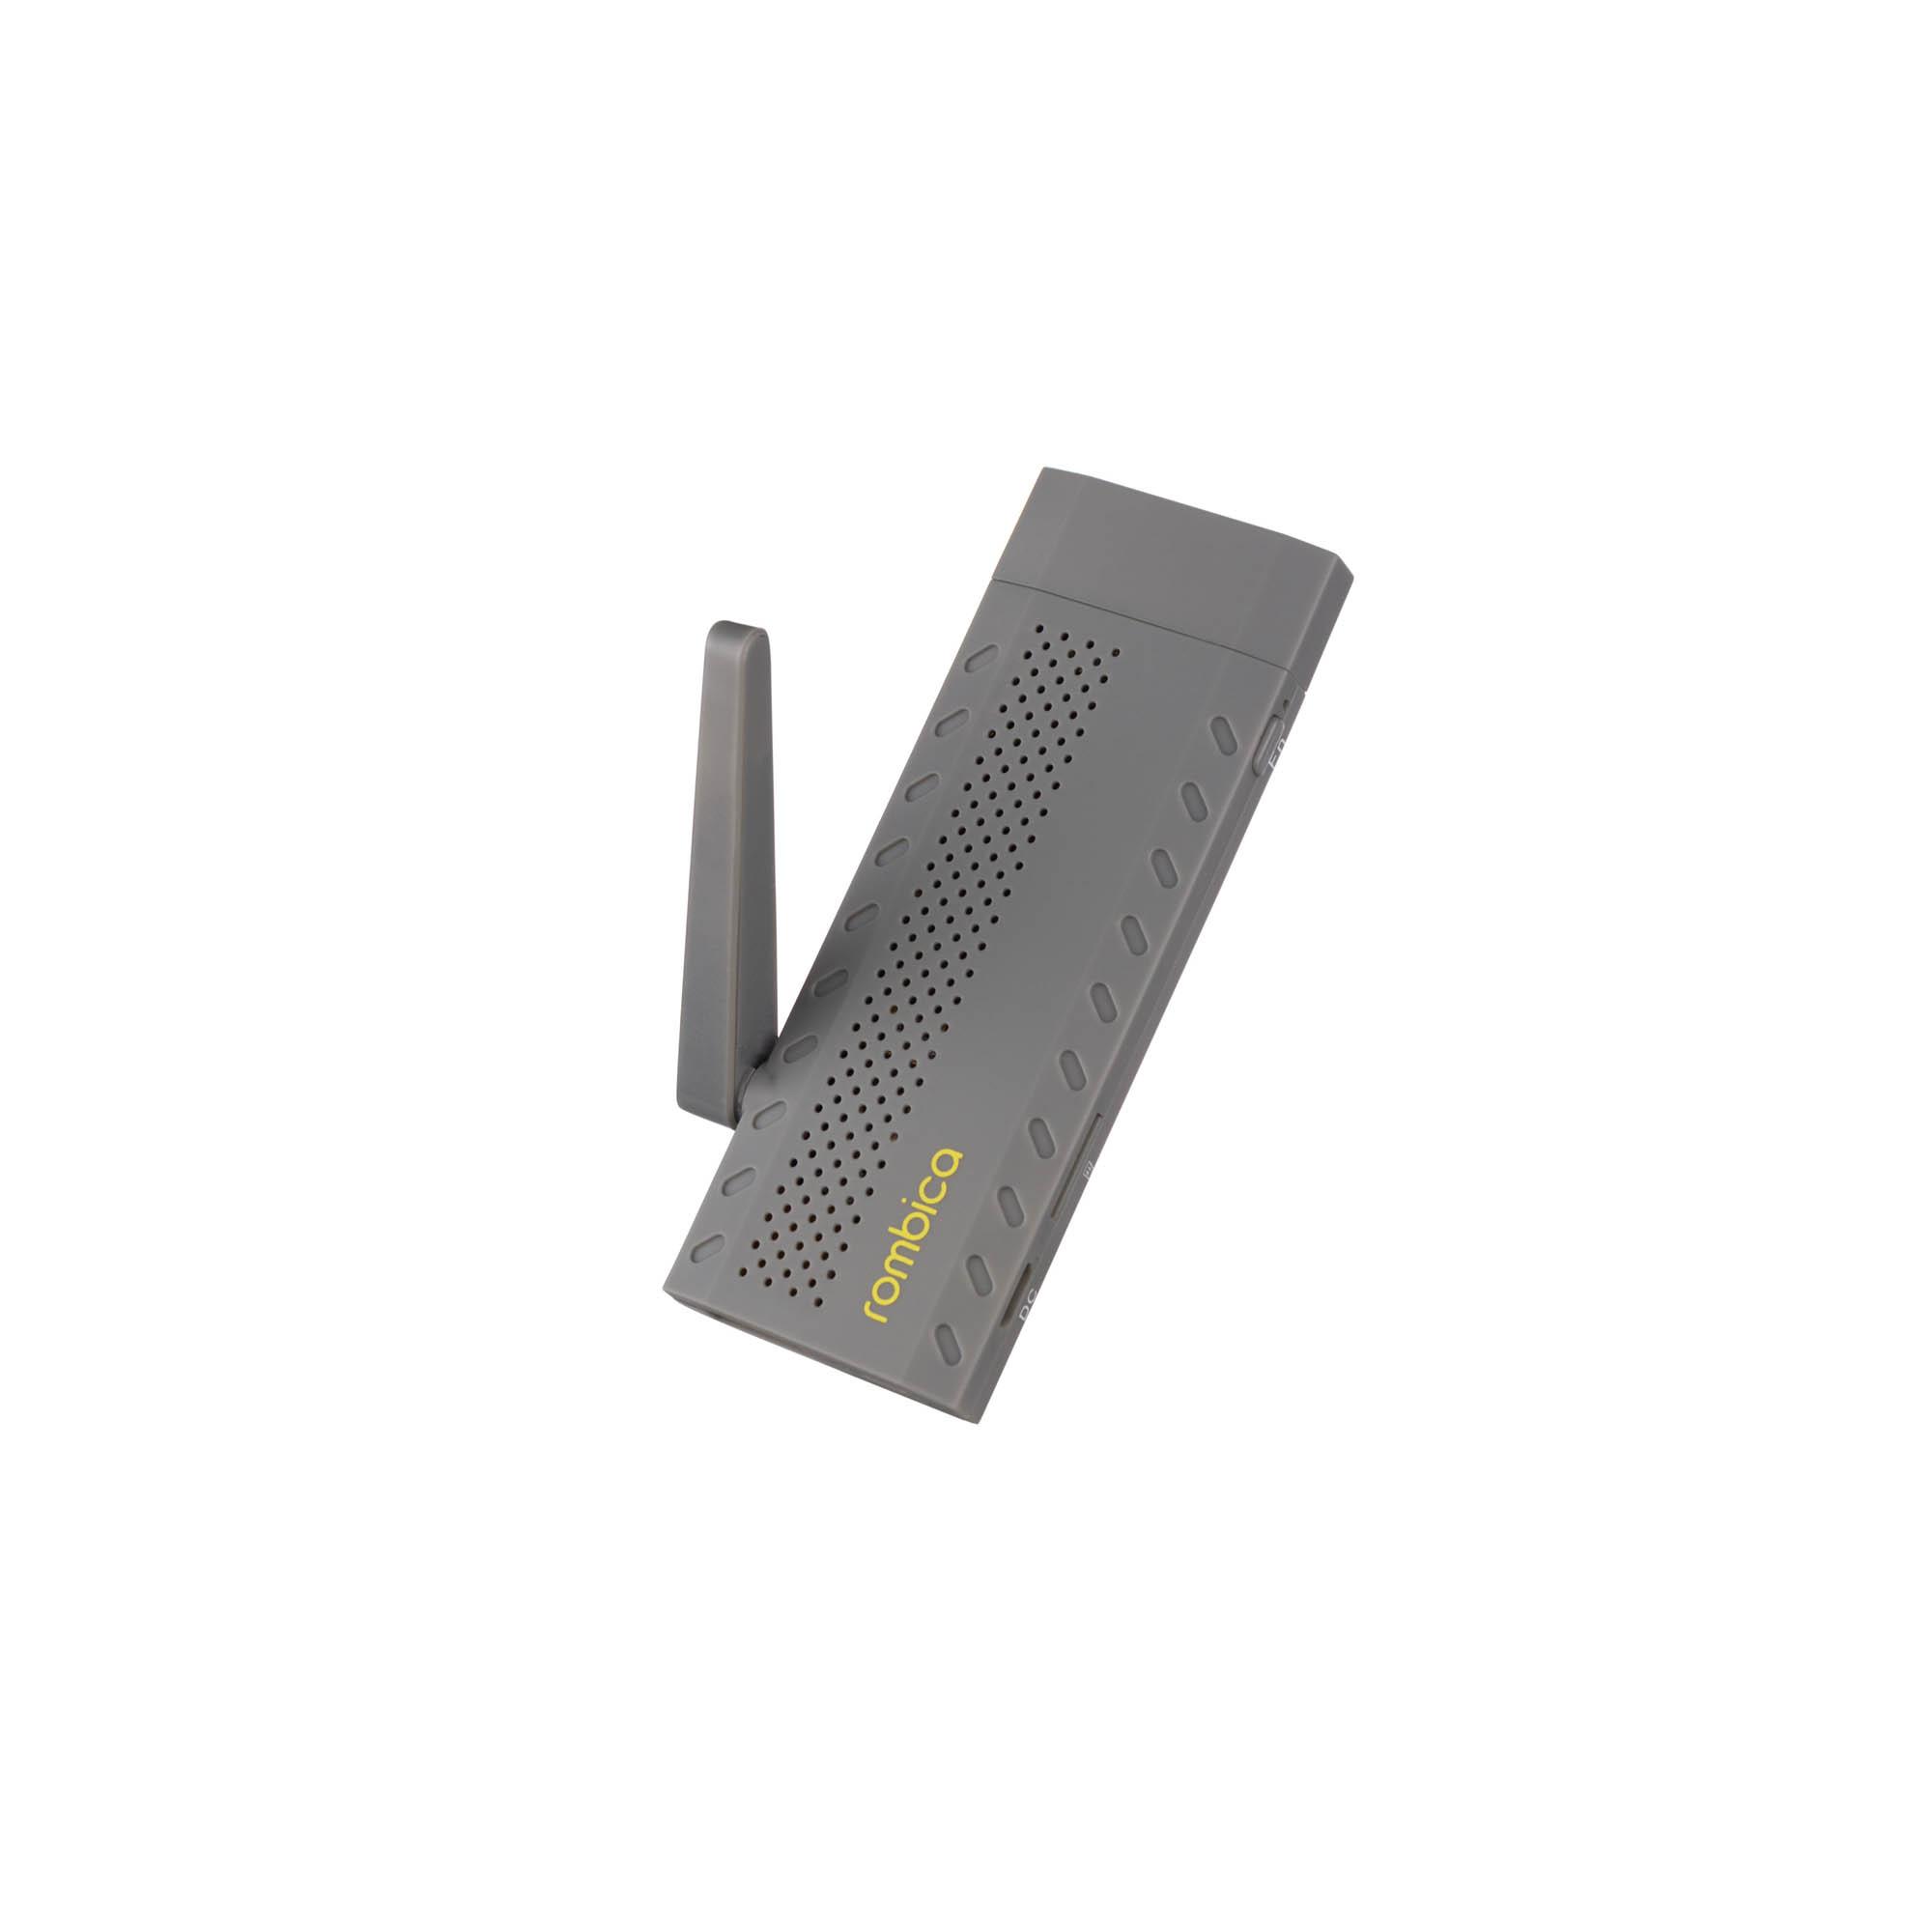 Rombica Smart Stick Quad v001